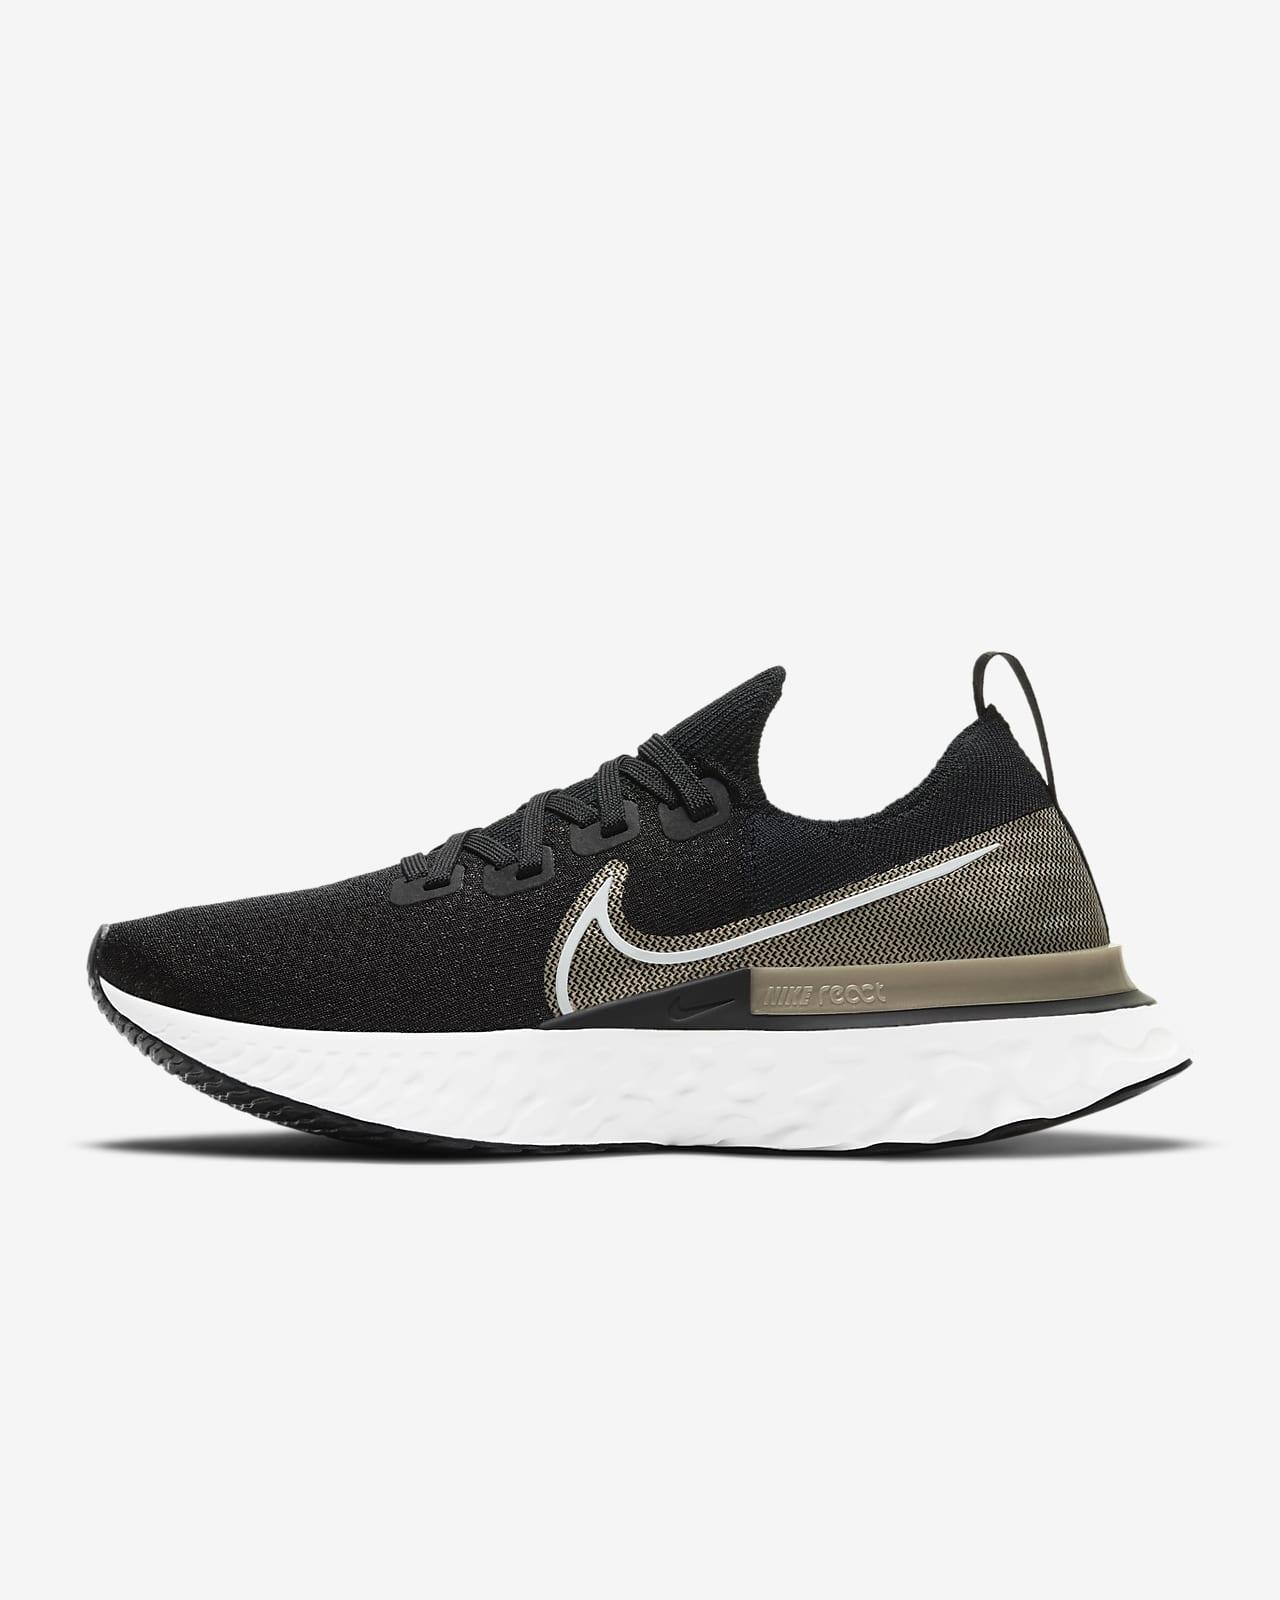 Nike React Infinity Run Flyknit Premium Women's Running Shoe